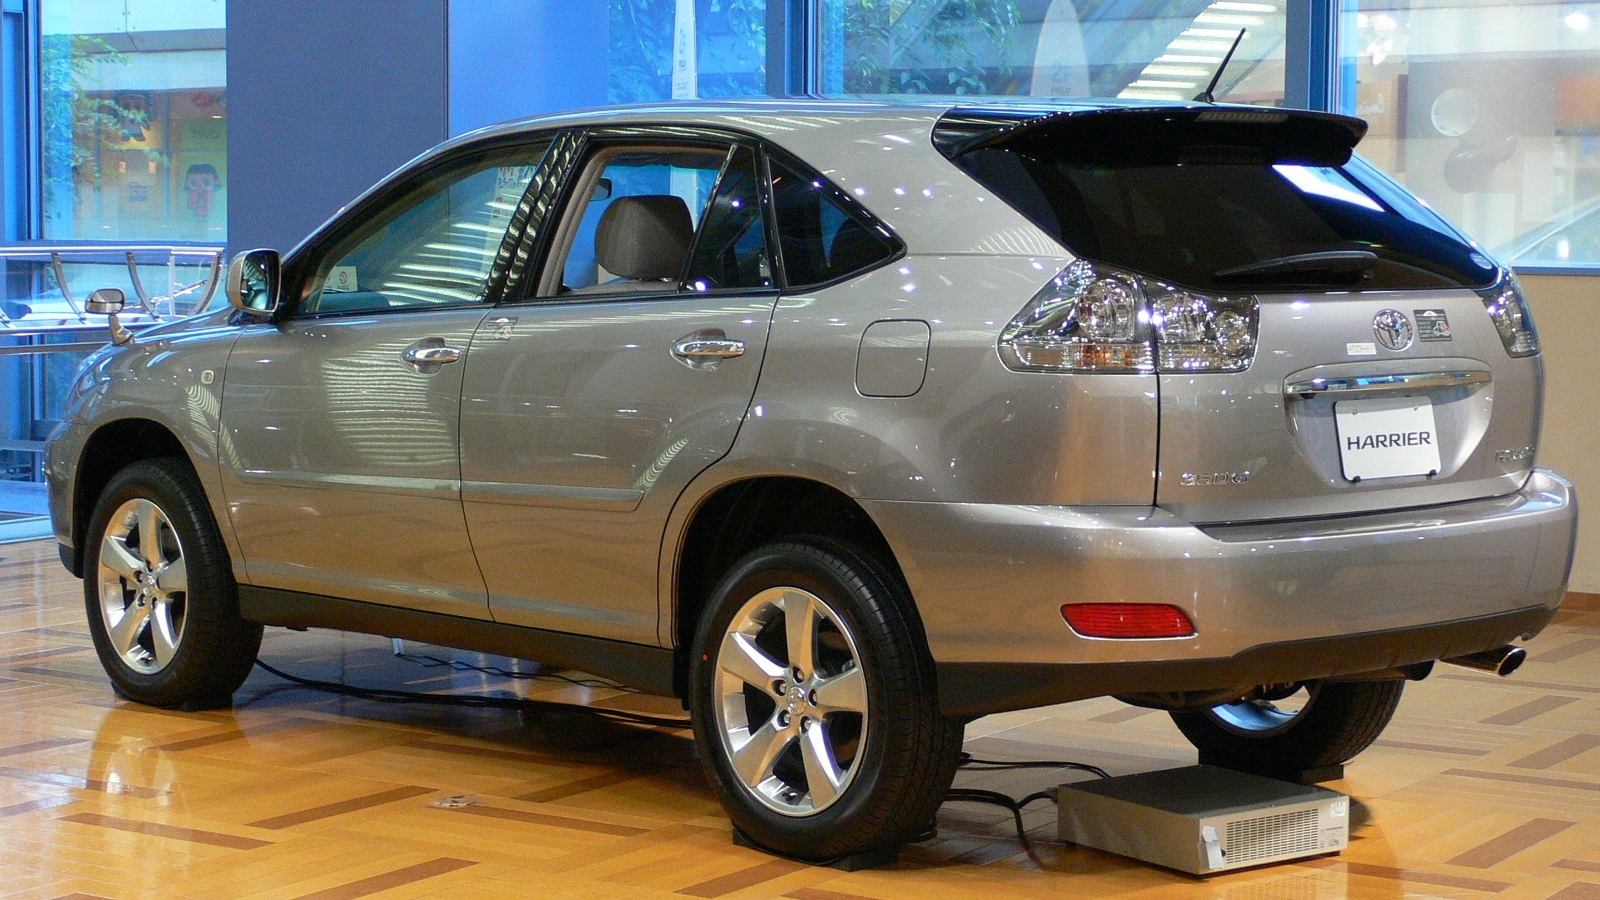 Toyota Harrier Photos Reviews News Specs Buy Car